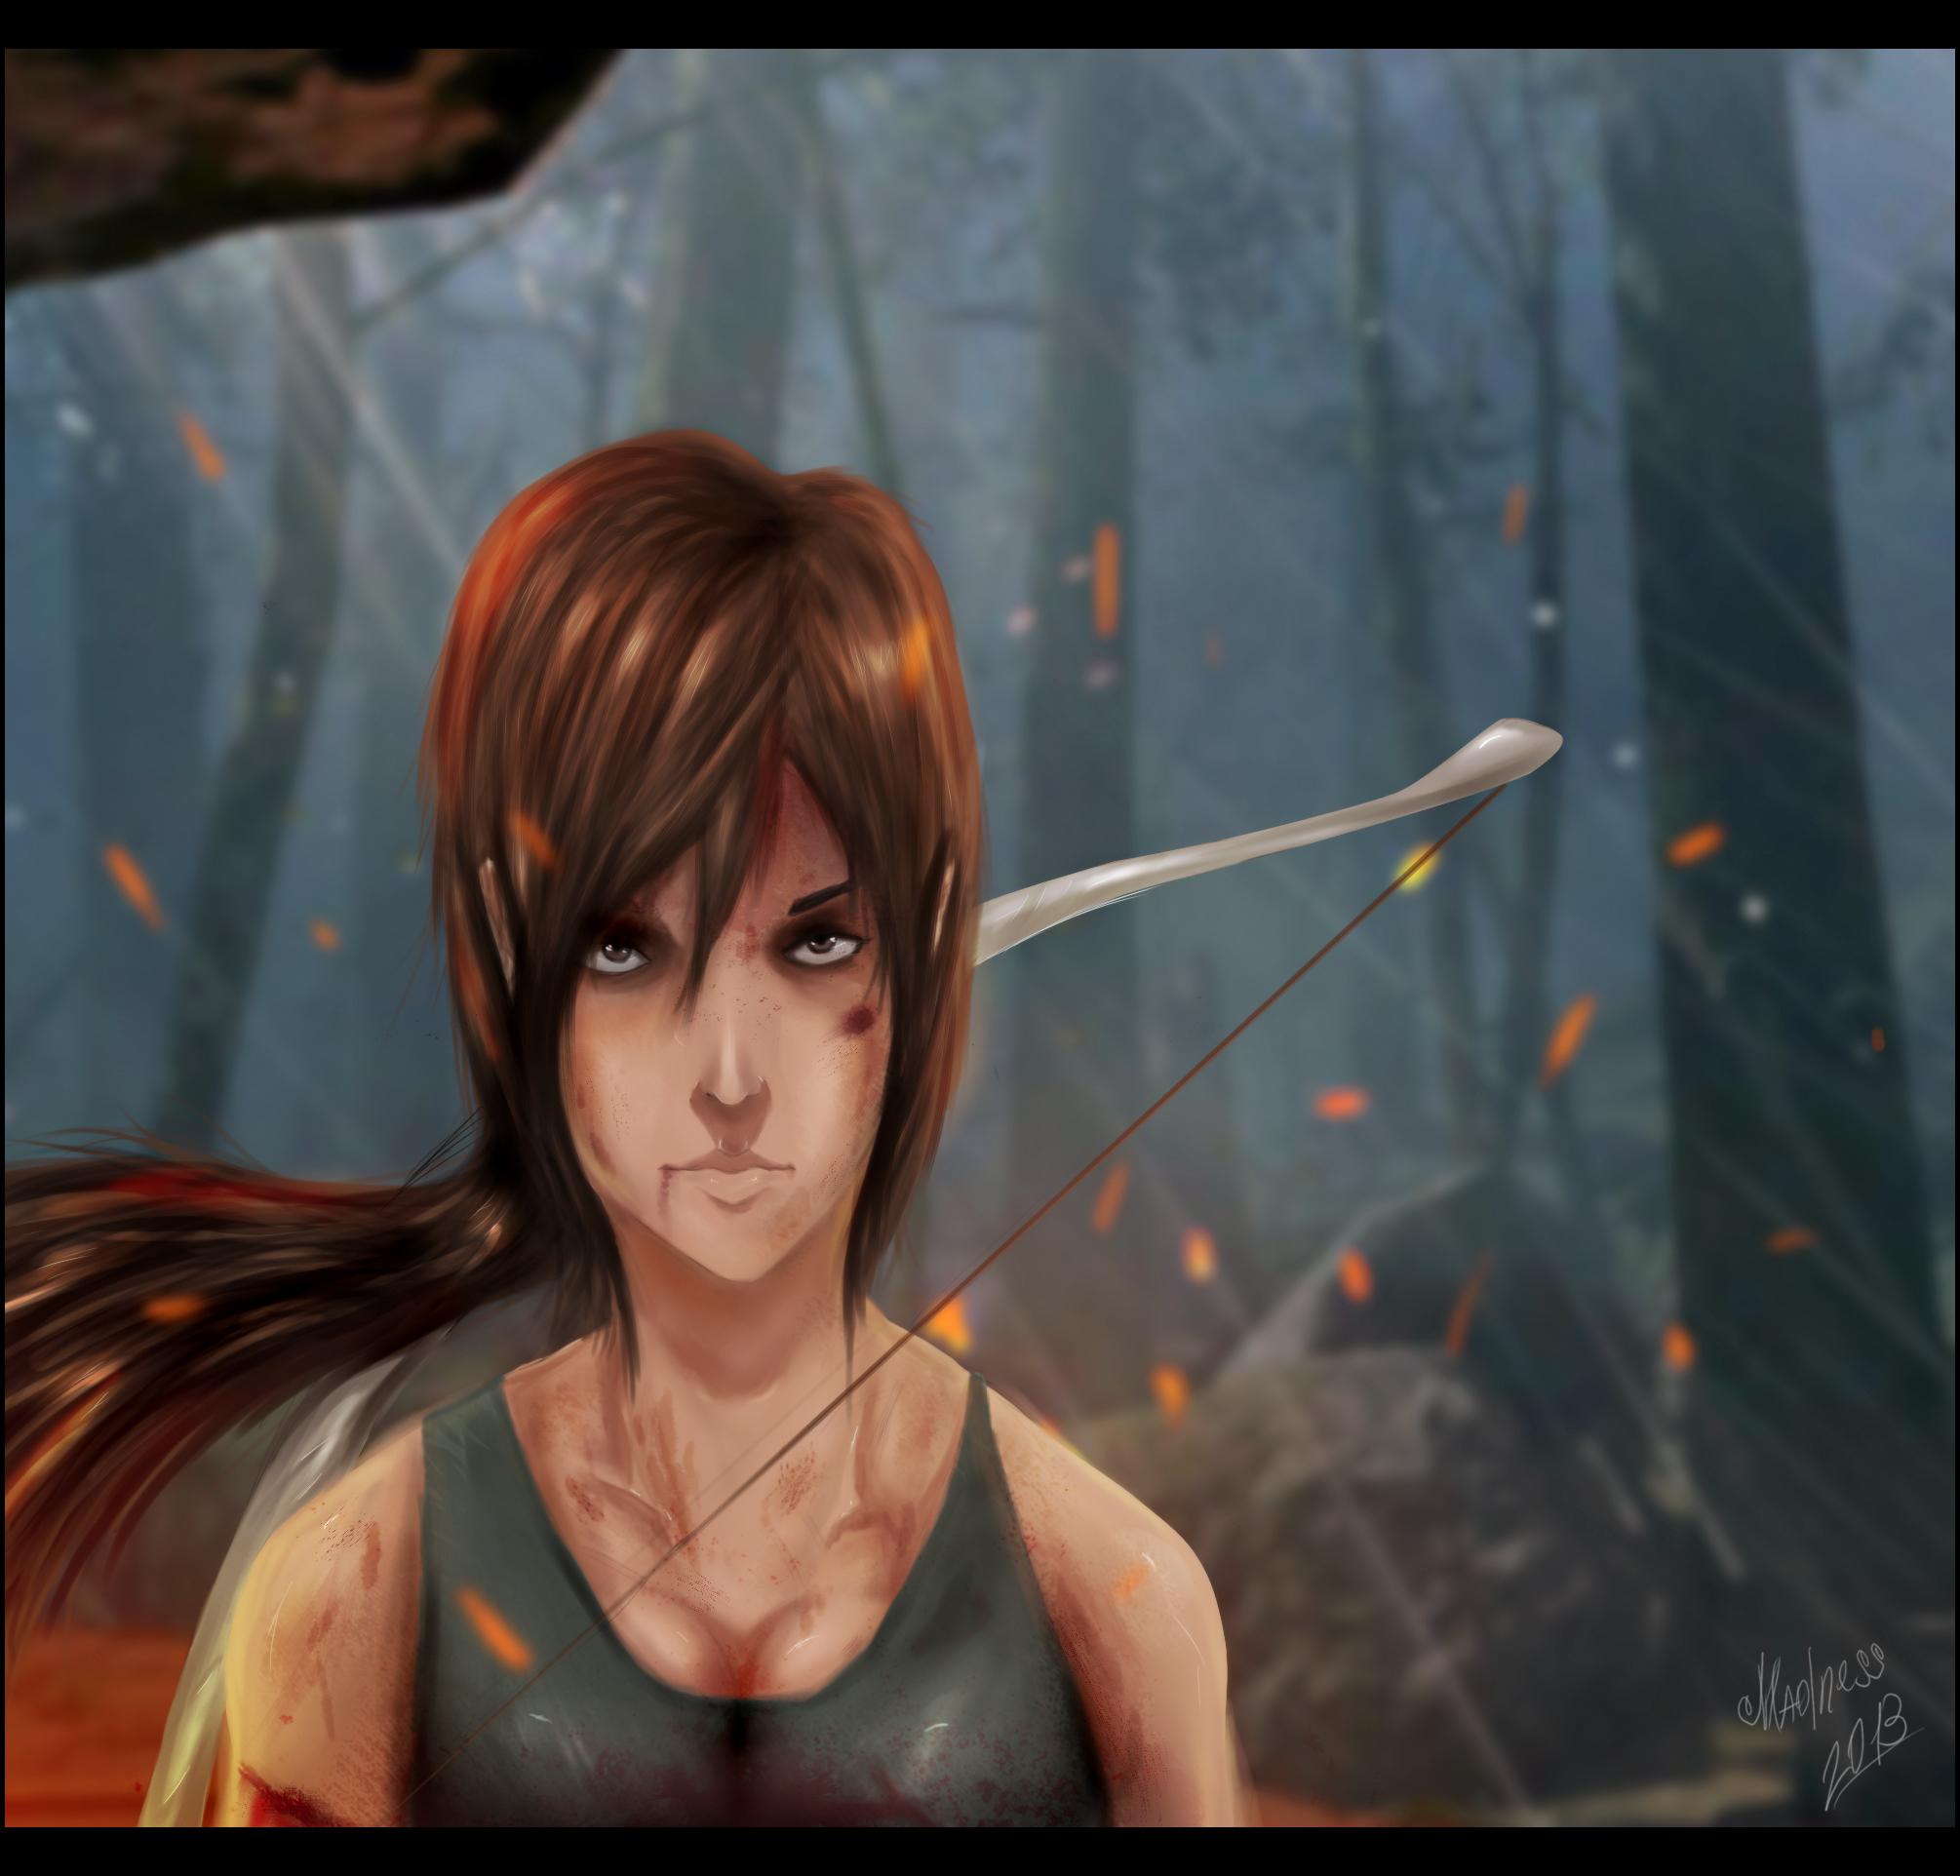 Tomb Raider 2013: Tomb Raider 2013 By Madnesssss On DeviantArt